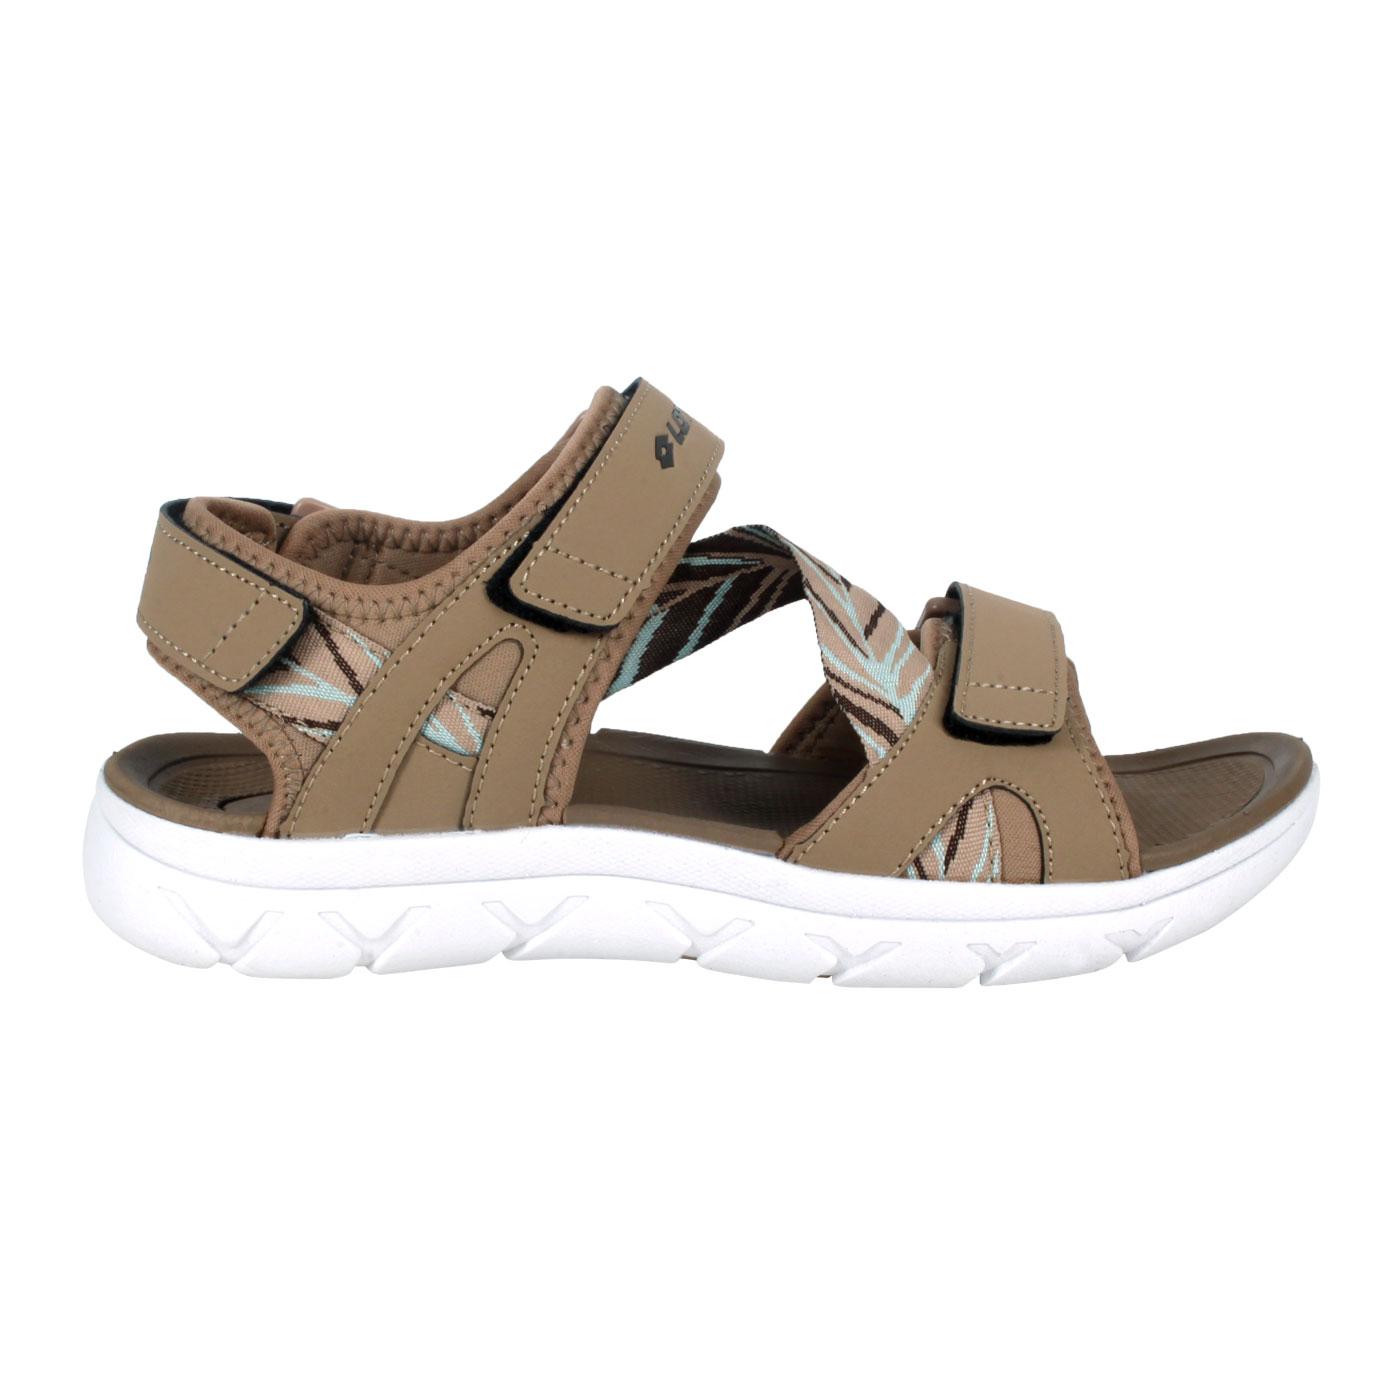 LOTTO 女款圖紋織帶涼鞋 LT1AWS3361 - 淺棕深咖啡